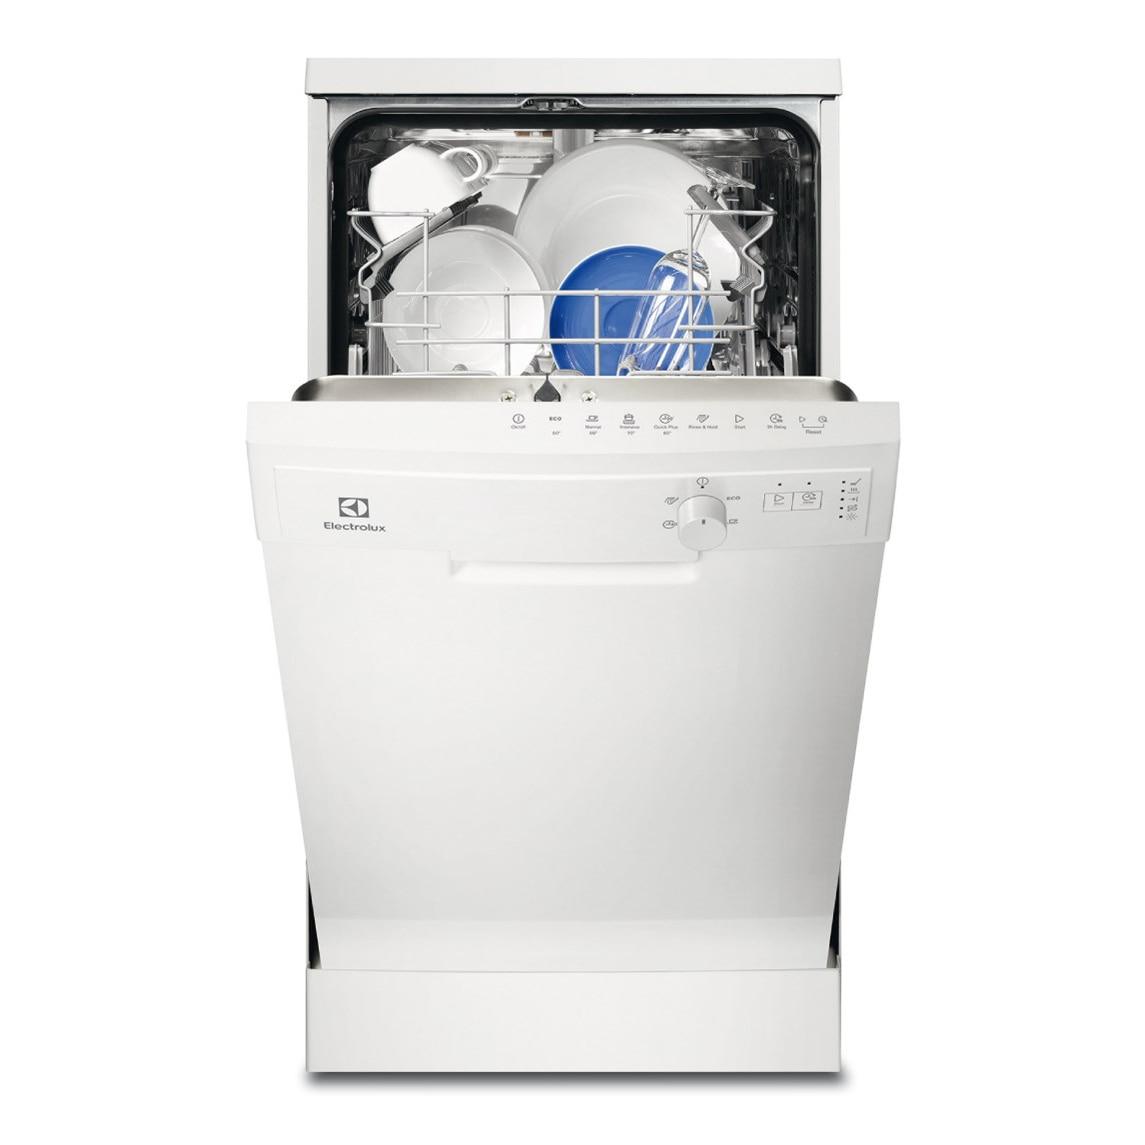 Fotografie Masina de spalat vase Electrolux ESF4202LOW, 9 seturi, 5 programe, Clasa A+, 45 cm, LED, Alb